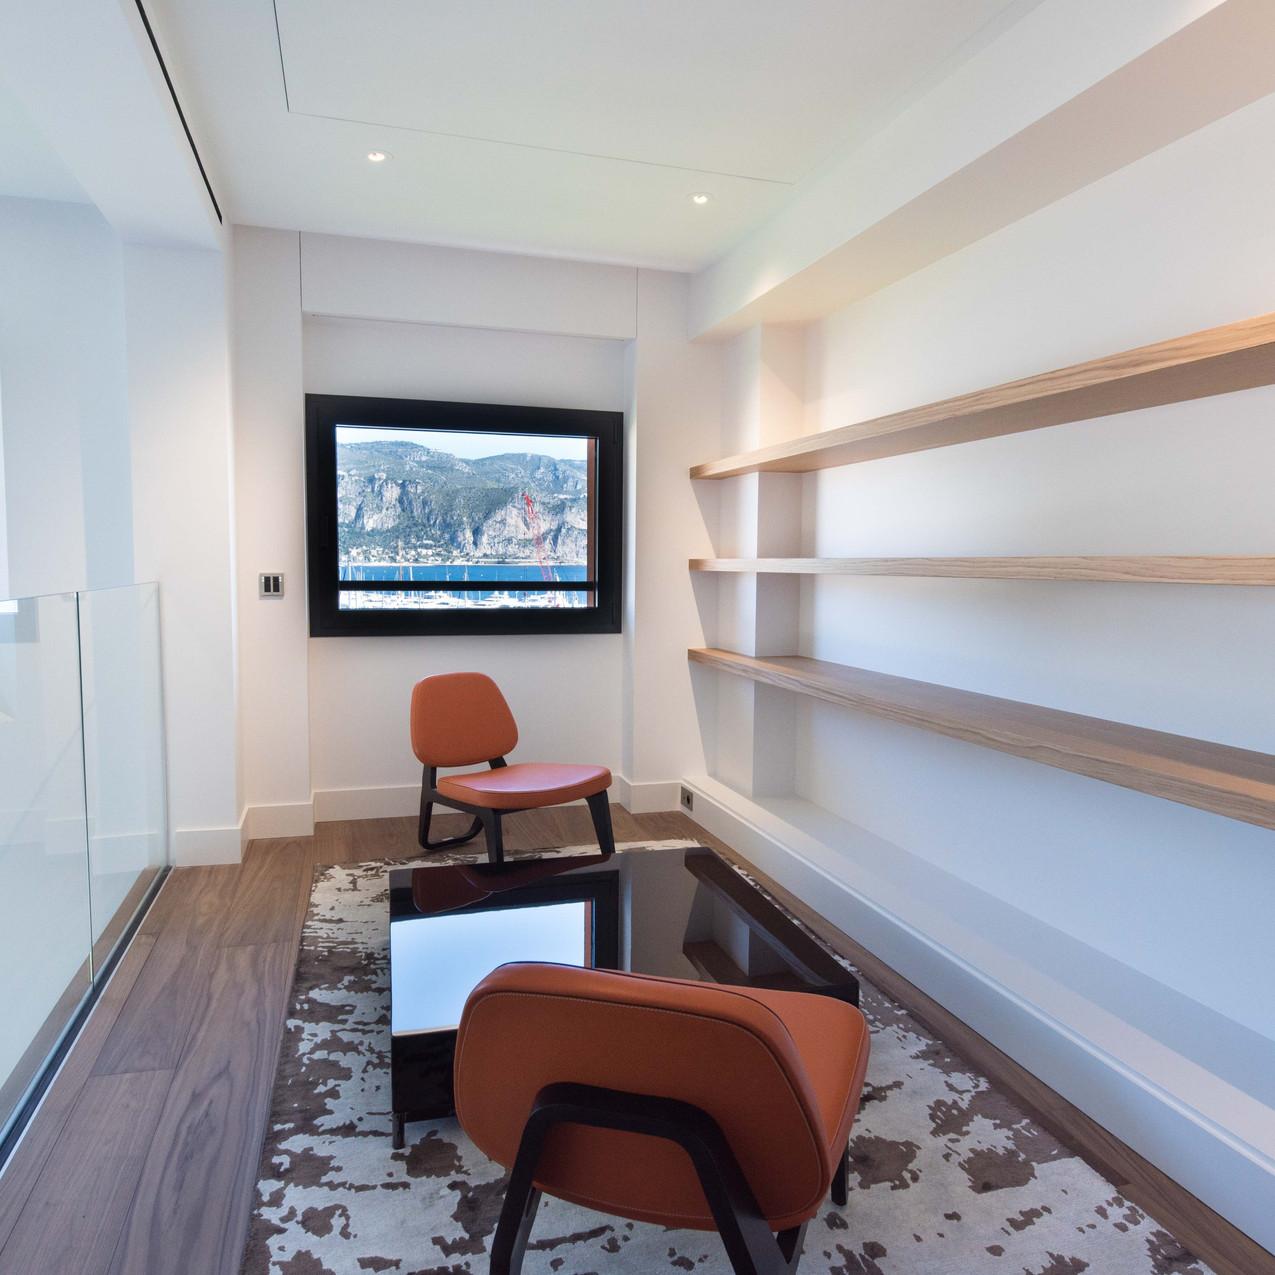 photographe architecture nice france french riviera paca cote dazur interieur-32